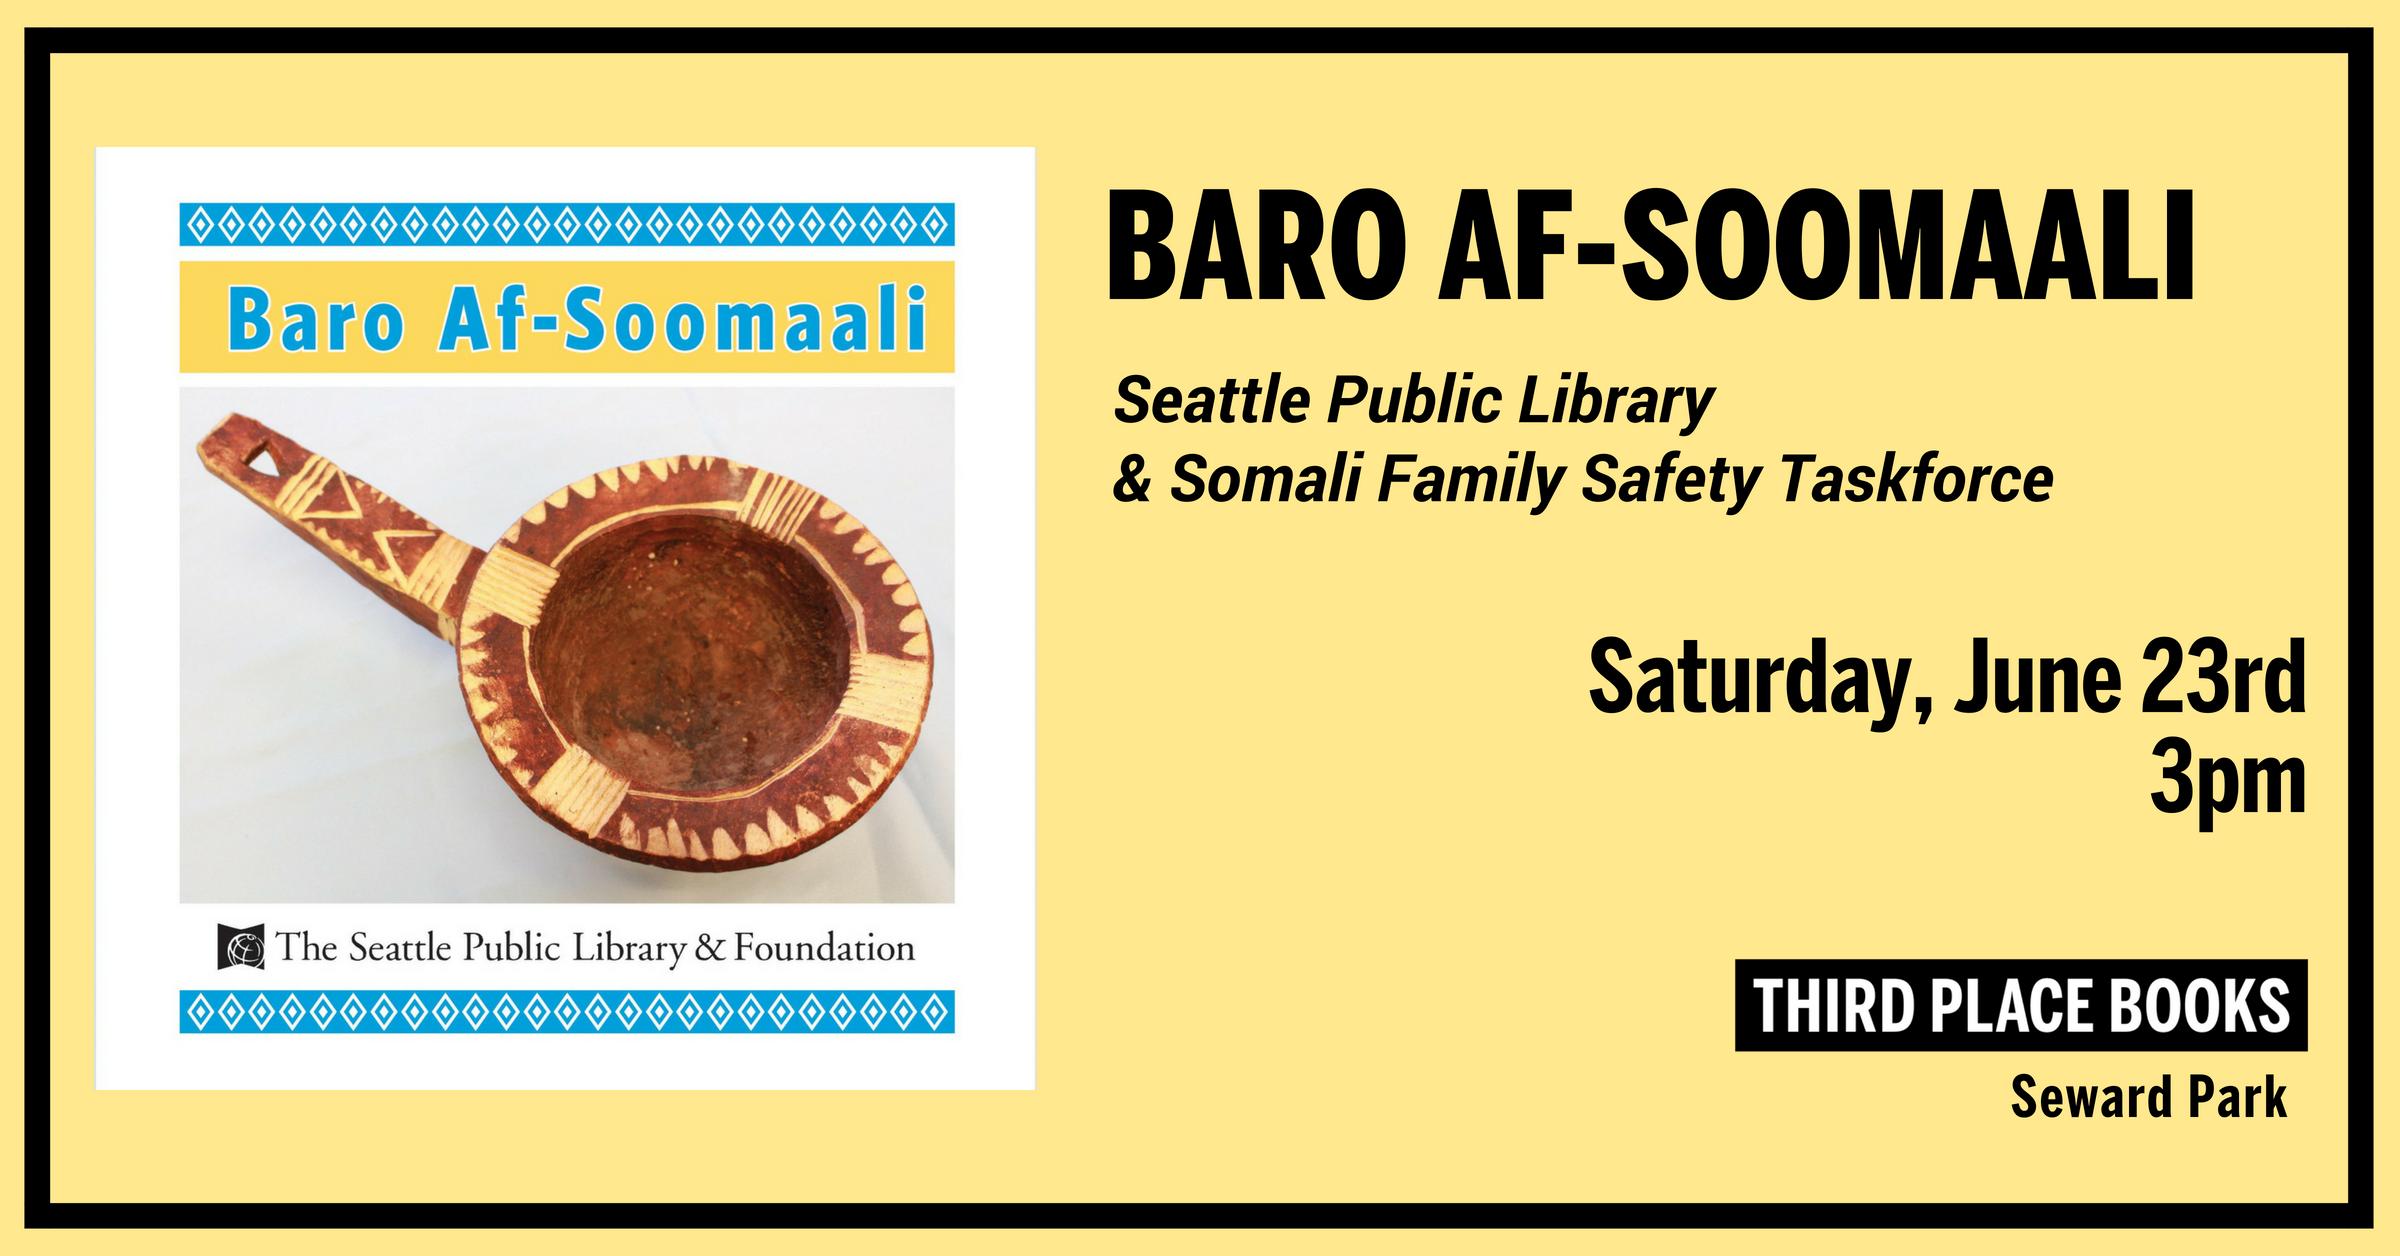 Baro Af-Soomaali on Saturday, June 23rd at 3pm